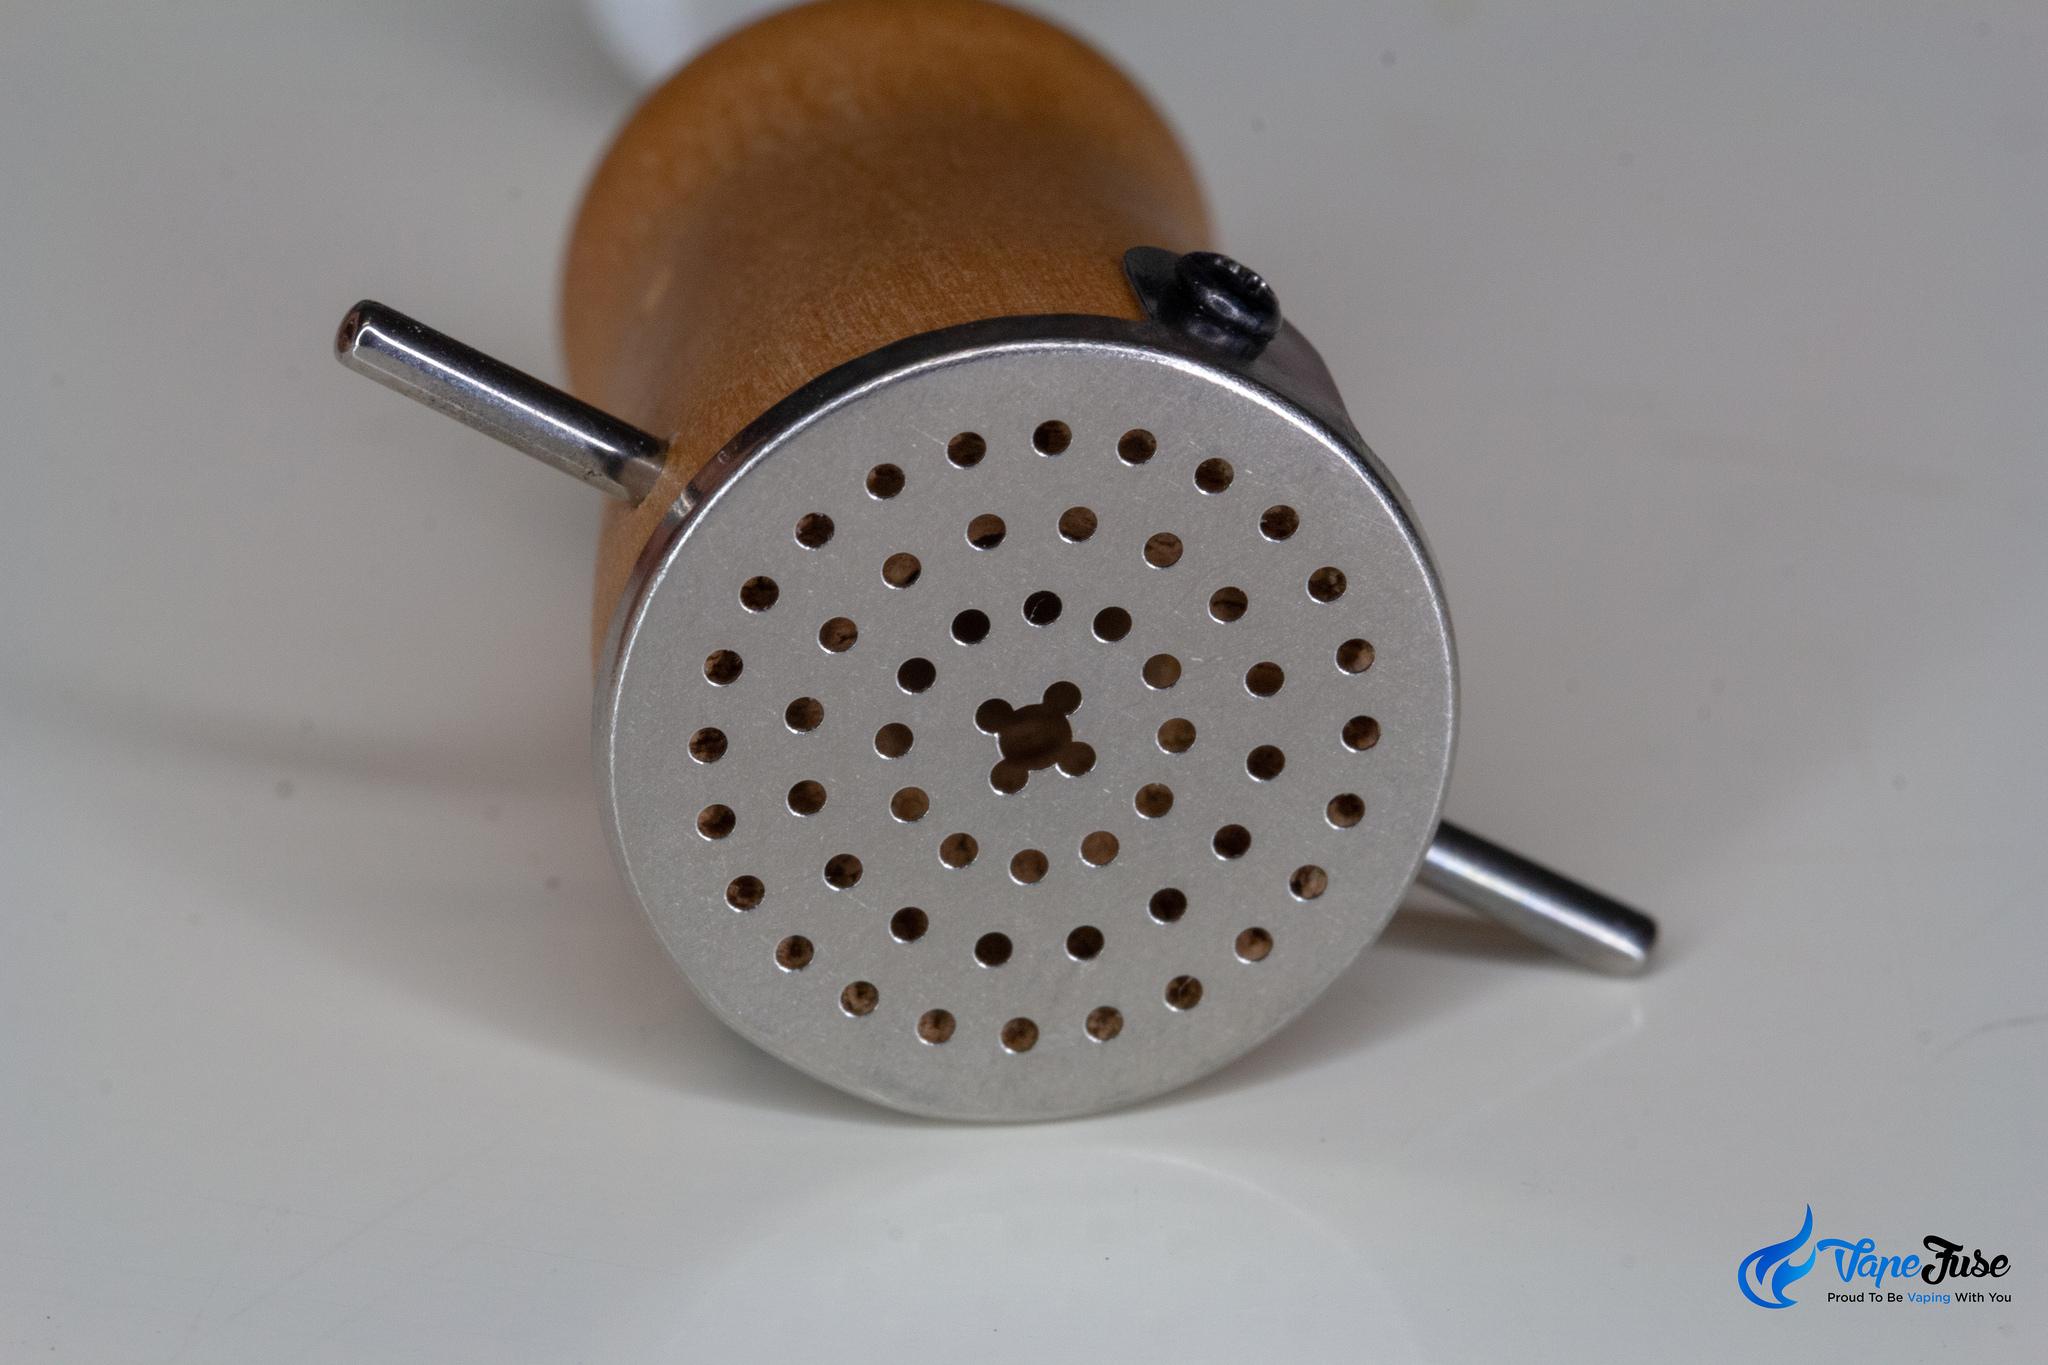 VapMan Vaporizer mouthpiece filter